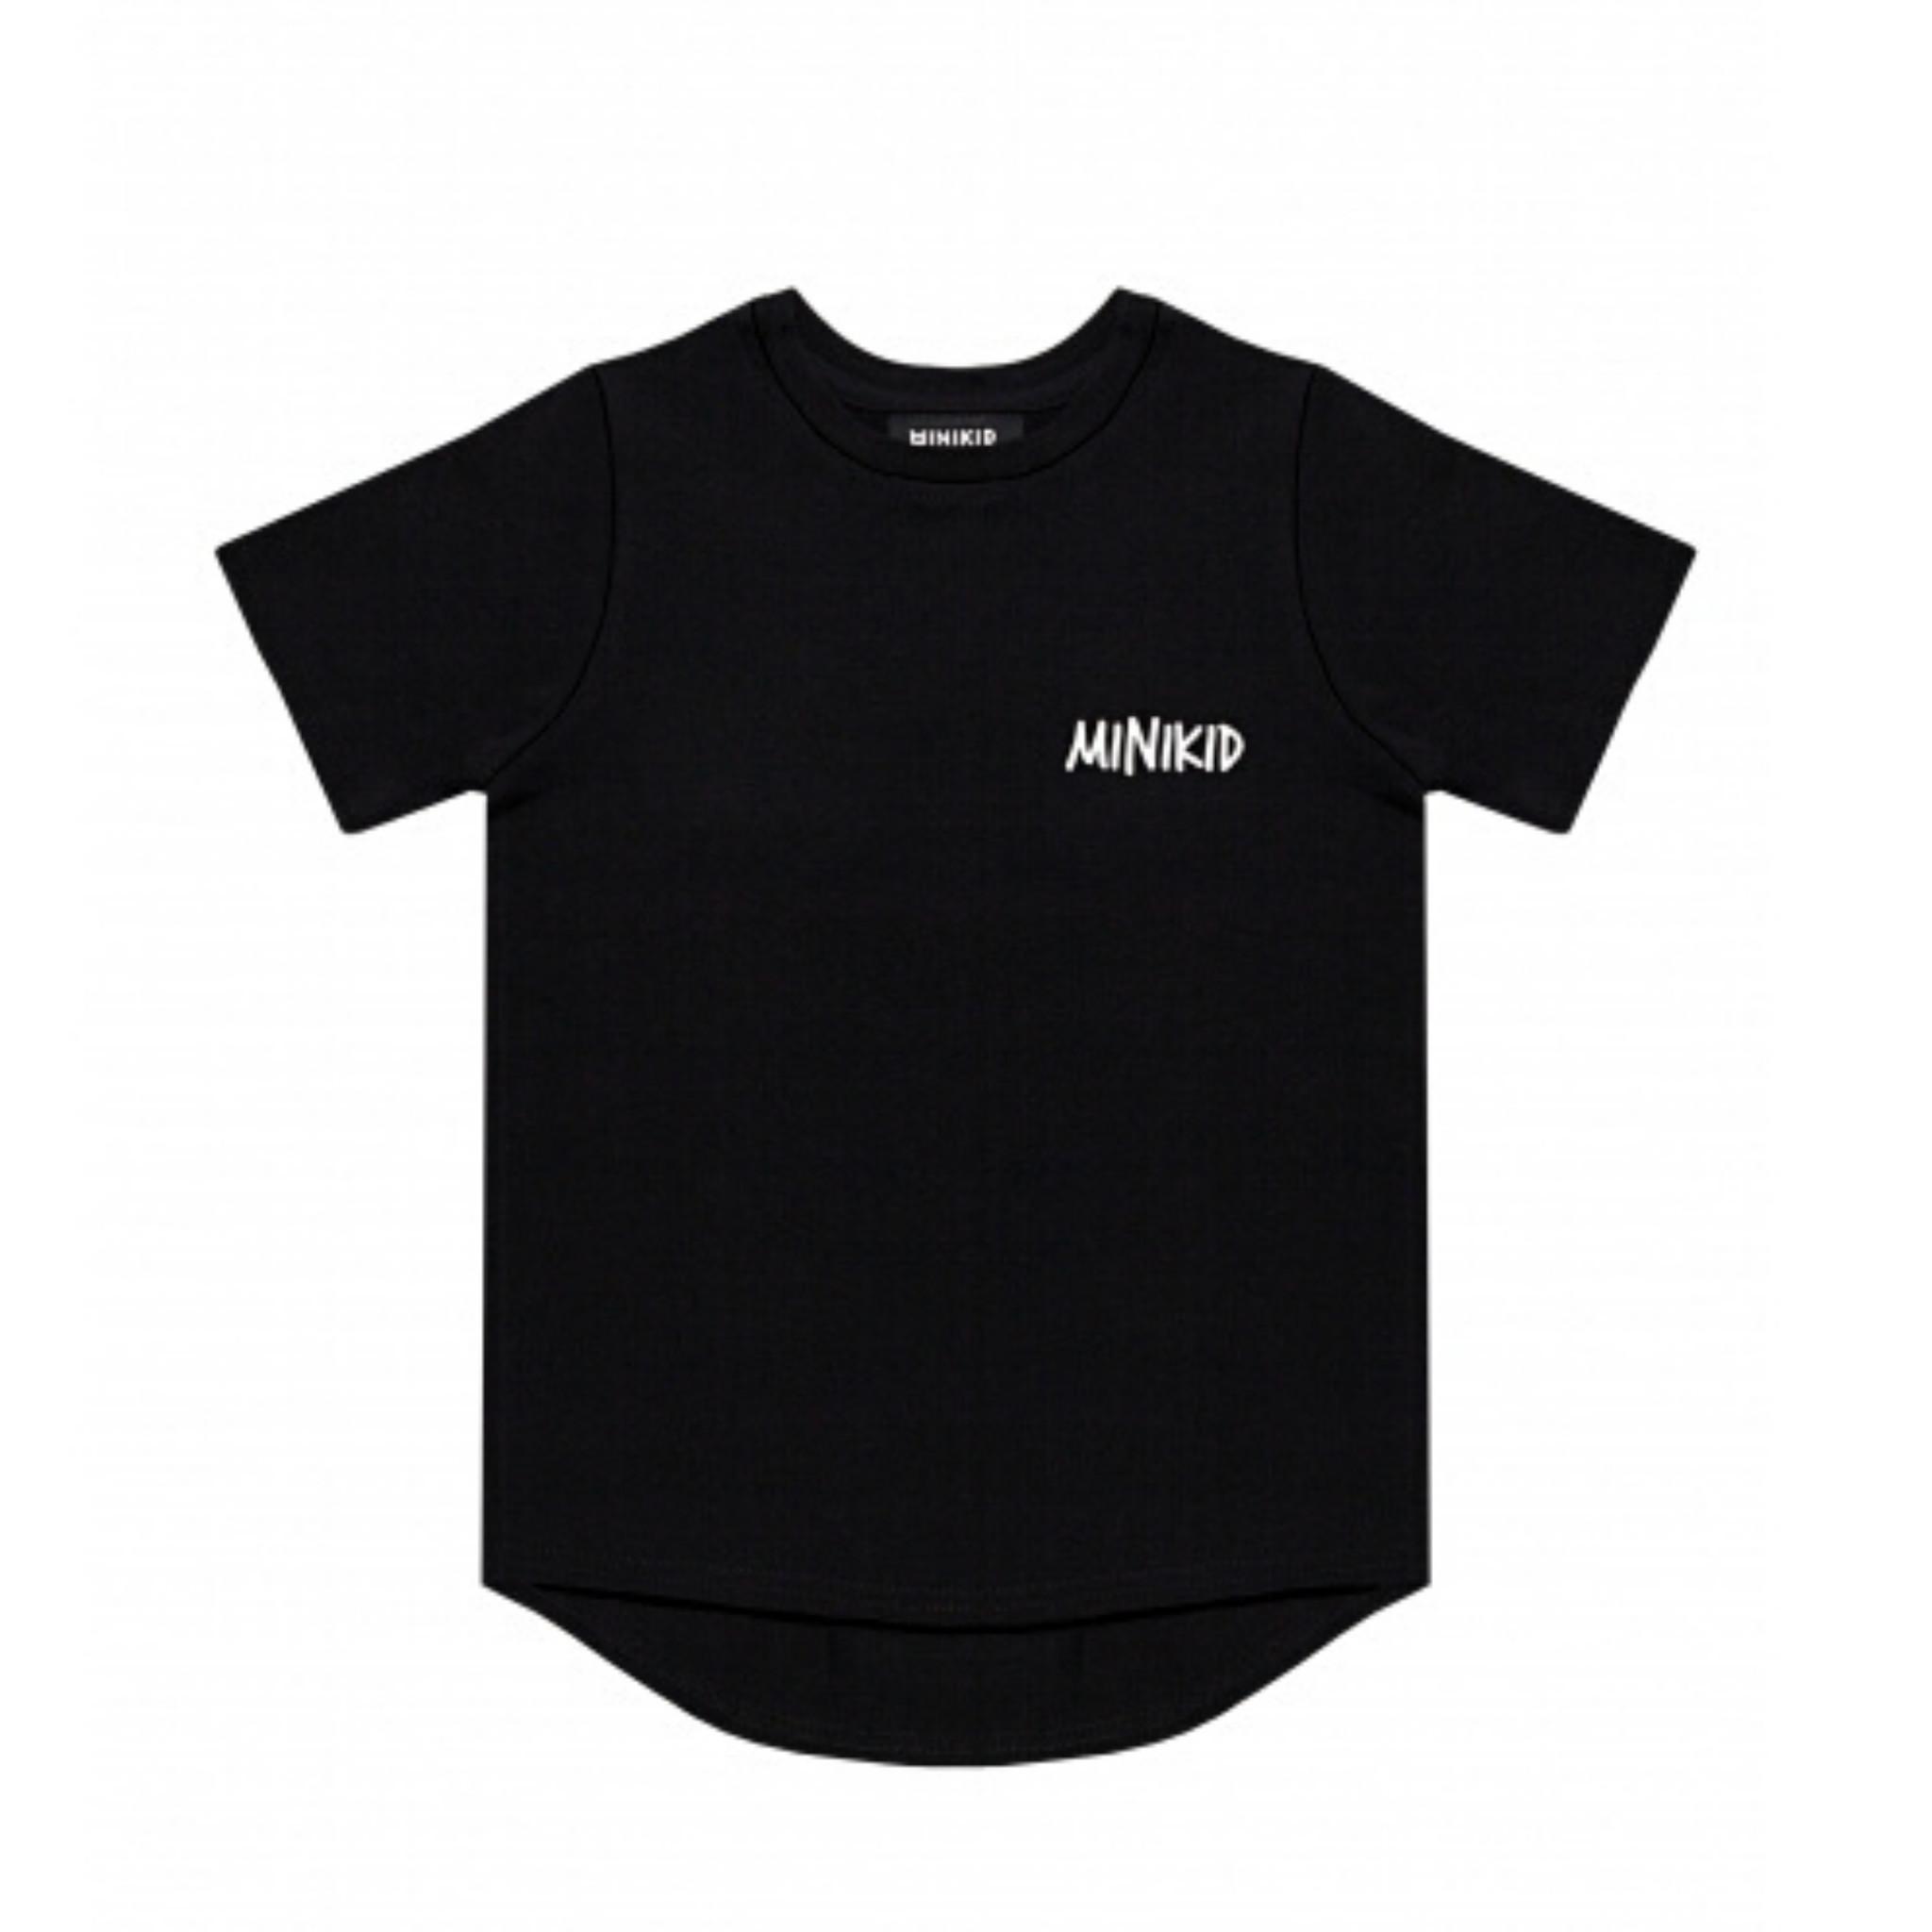 Minikid COOL T-SHIRT CHILDREN | LONGER BLACK SHIRT FOR BOYS | MINIKID